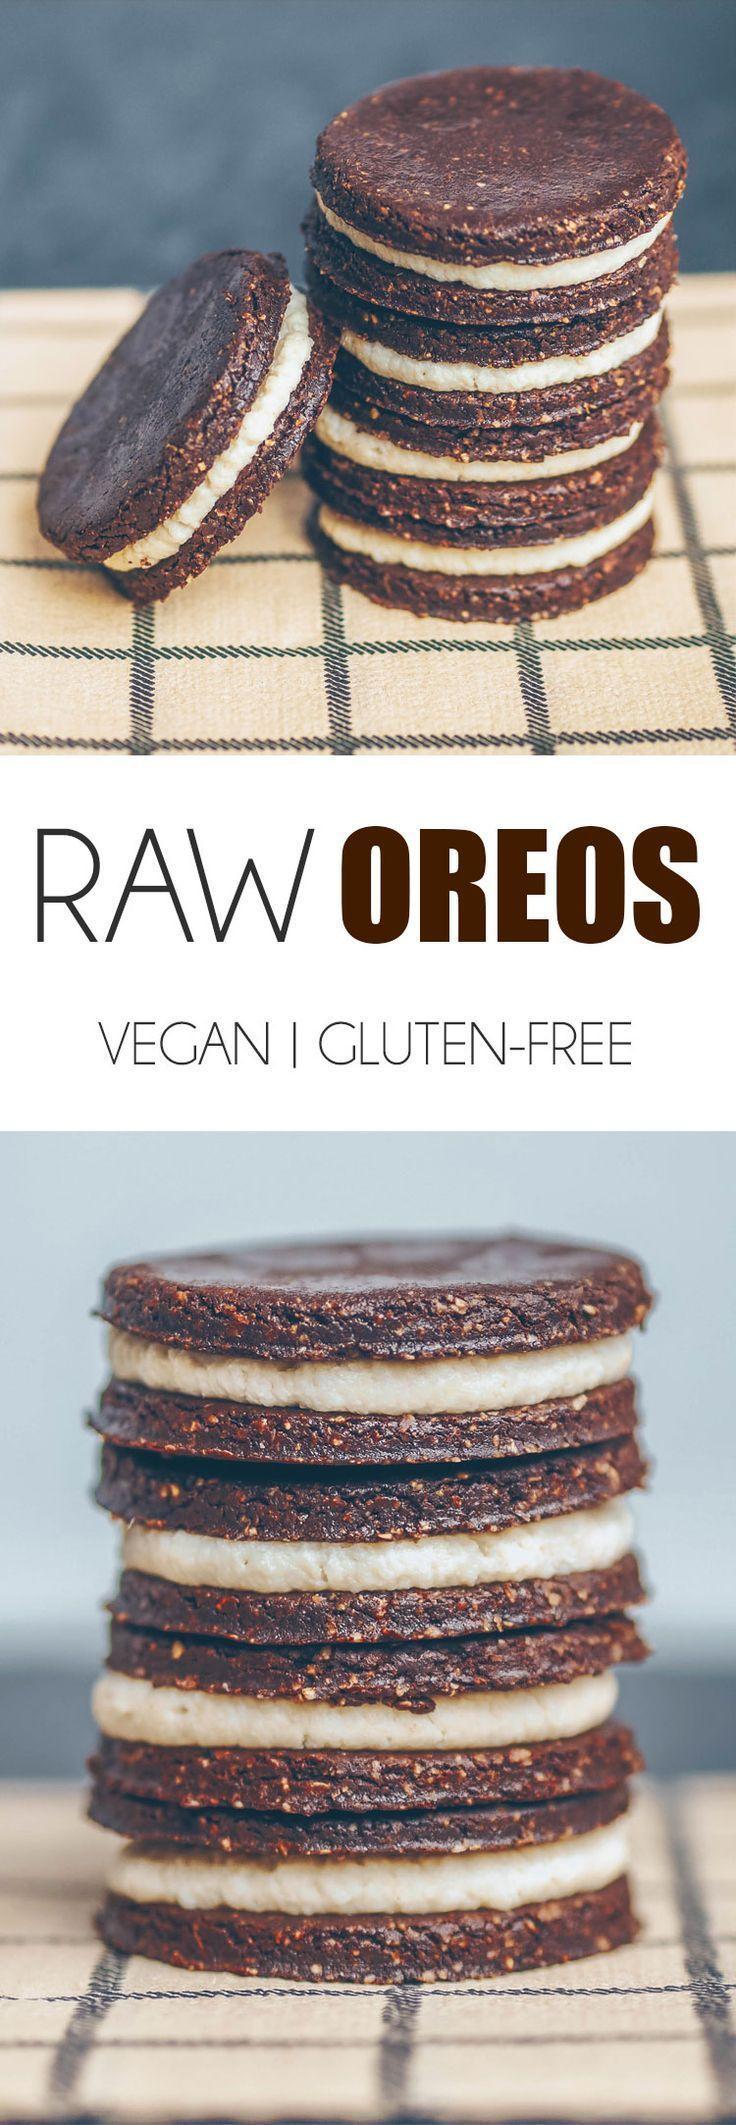 Raw Oreos Recipe (Vegan & Gluten-free) RAW VEGAN & GLUTEN-FREE OREOS